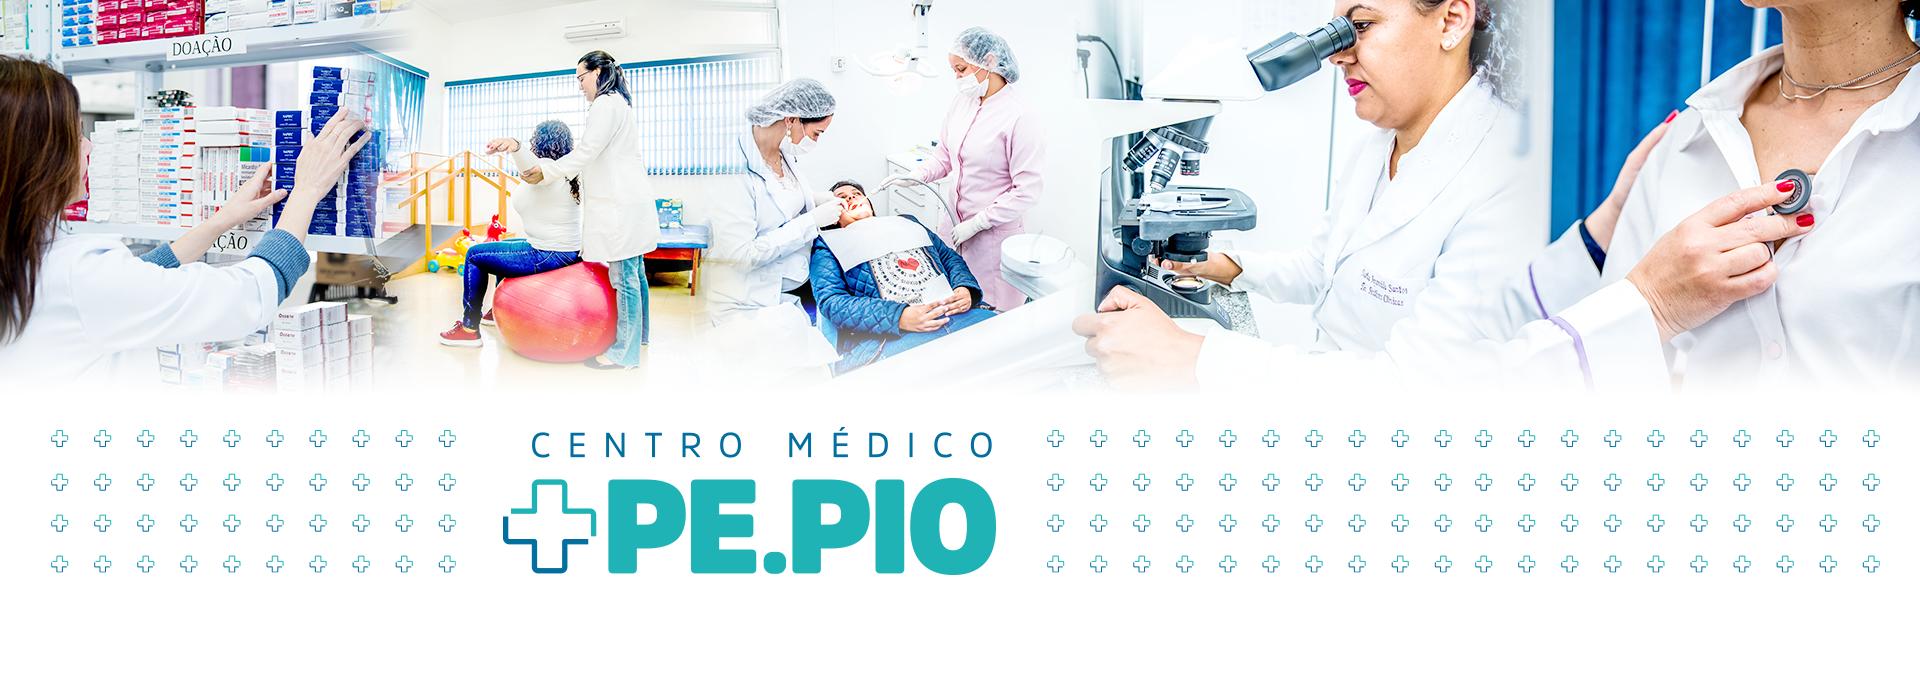 centro medico pe. pio